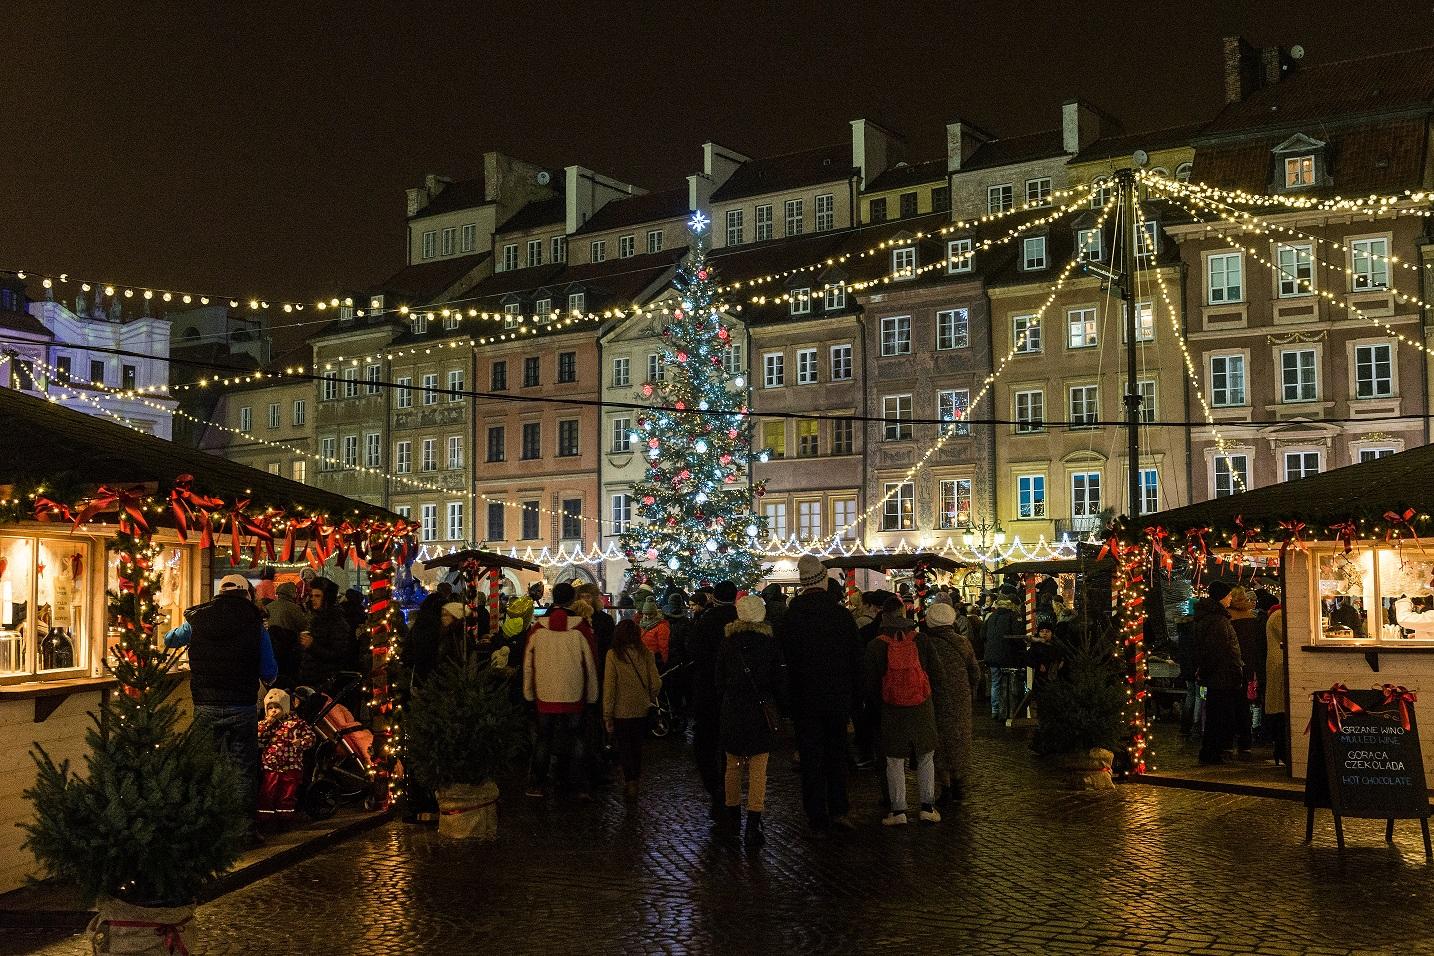 Christmas market_Old Town_Fot. Filip Kwiatkowski